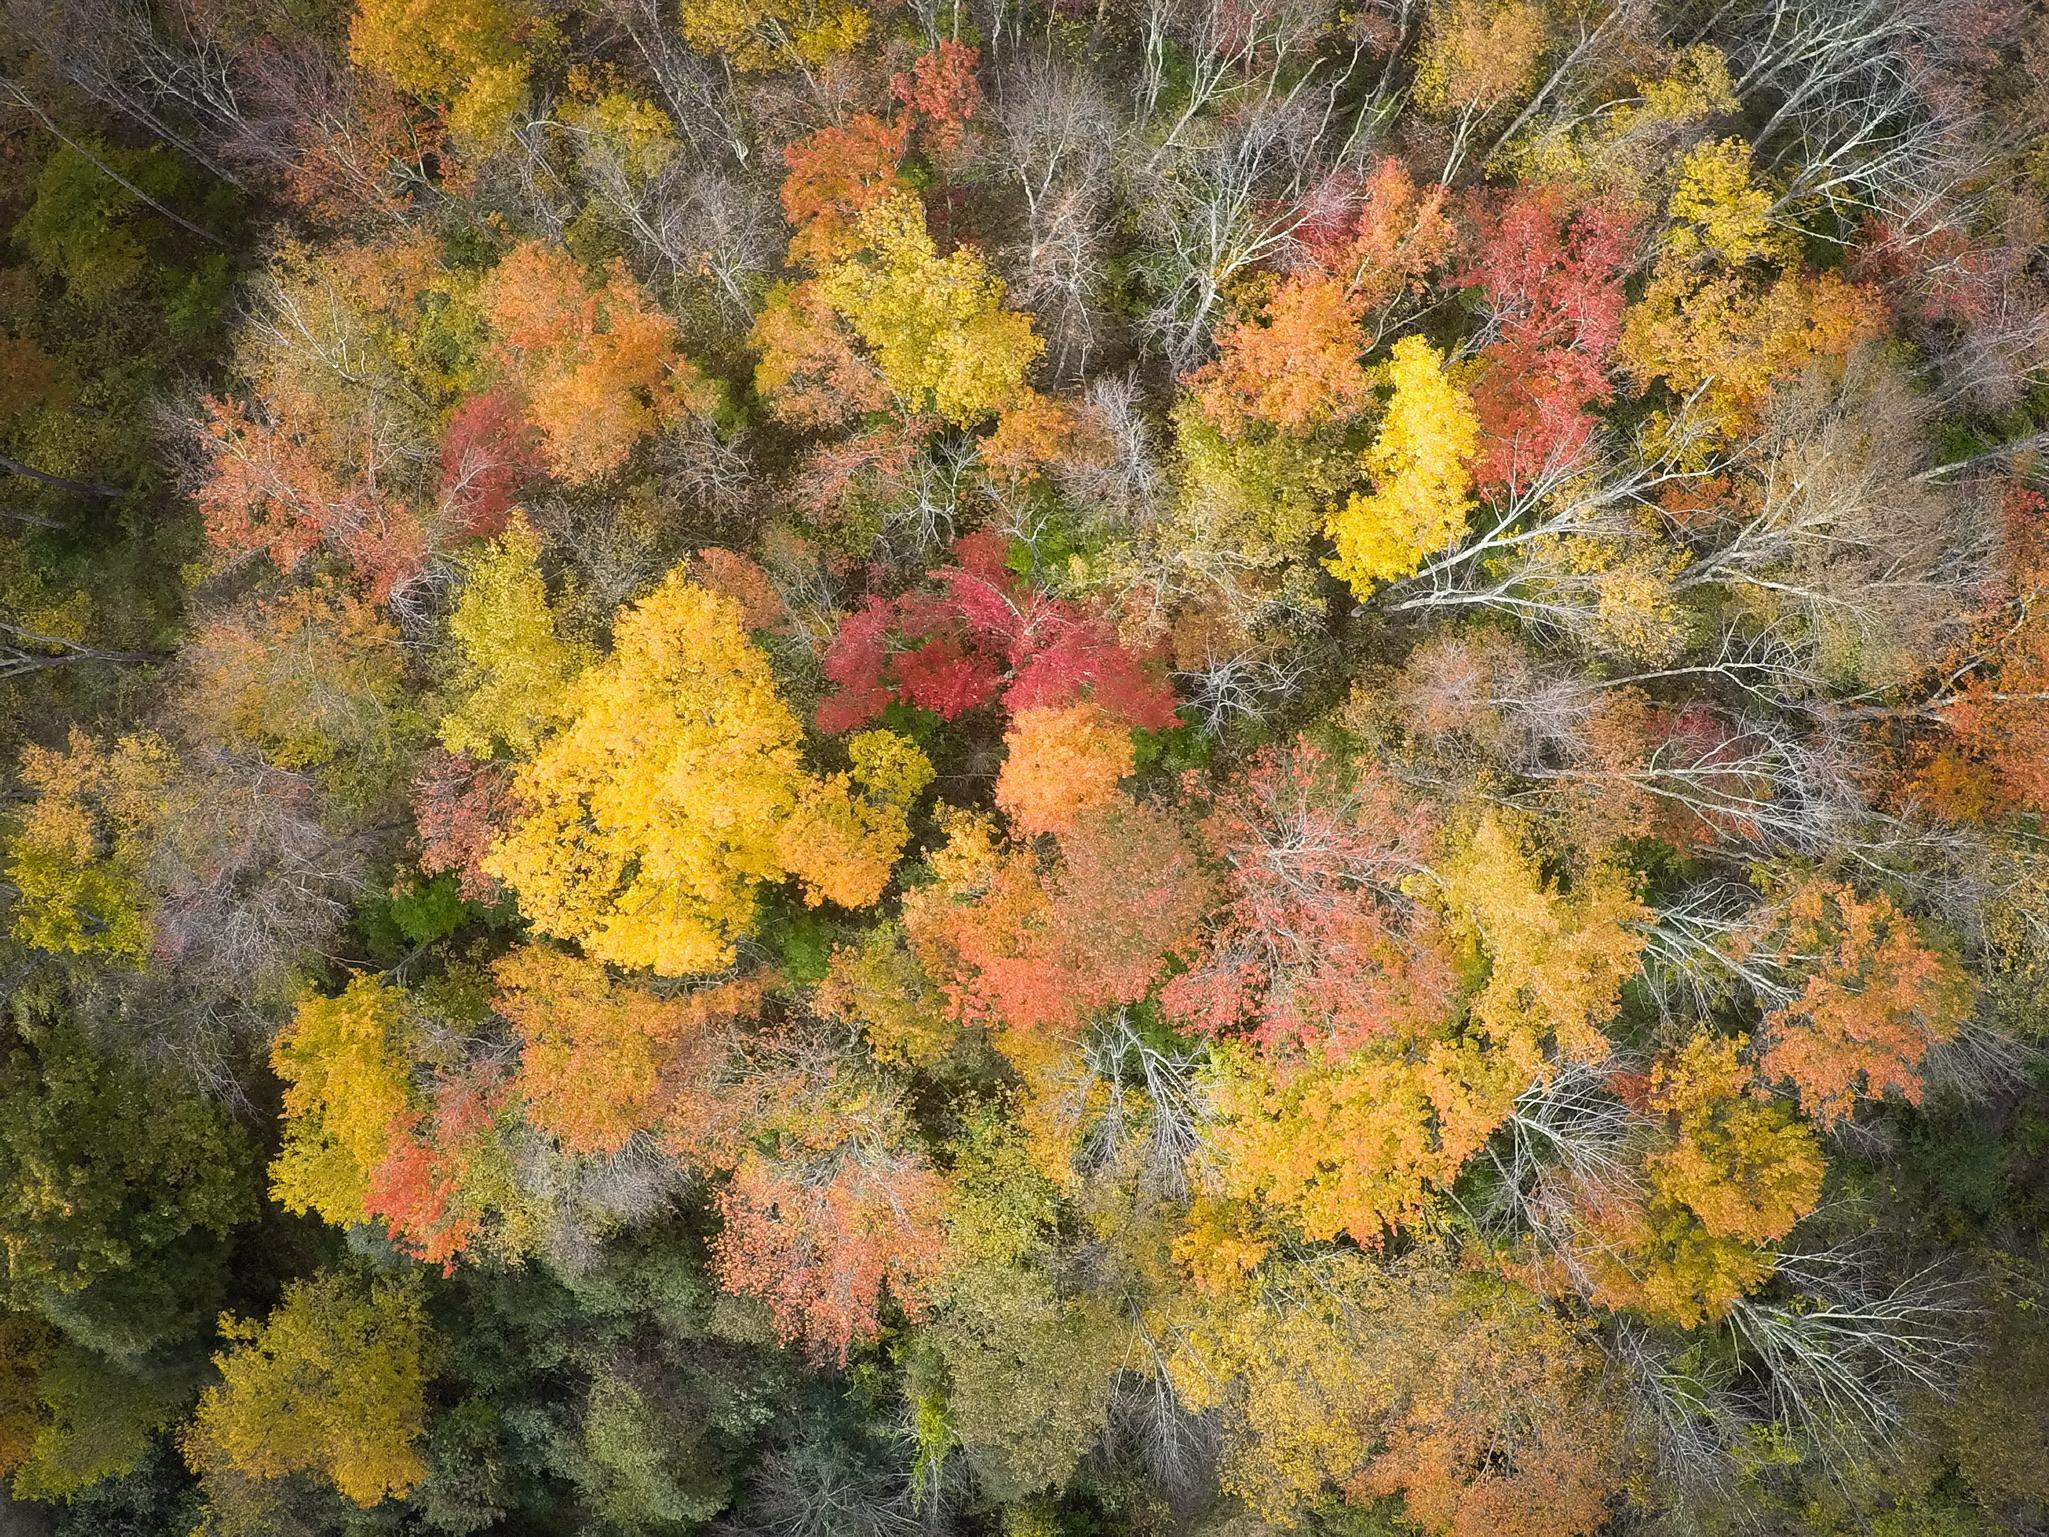 fall foliage overhead view